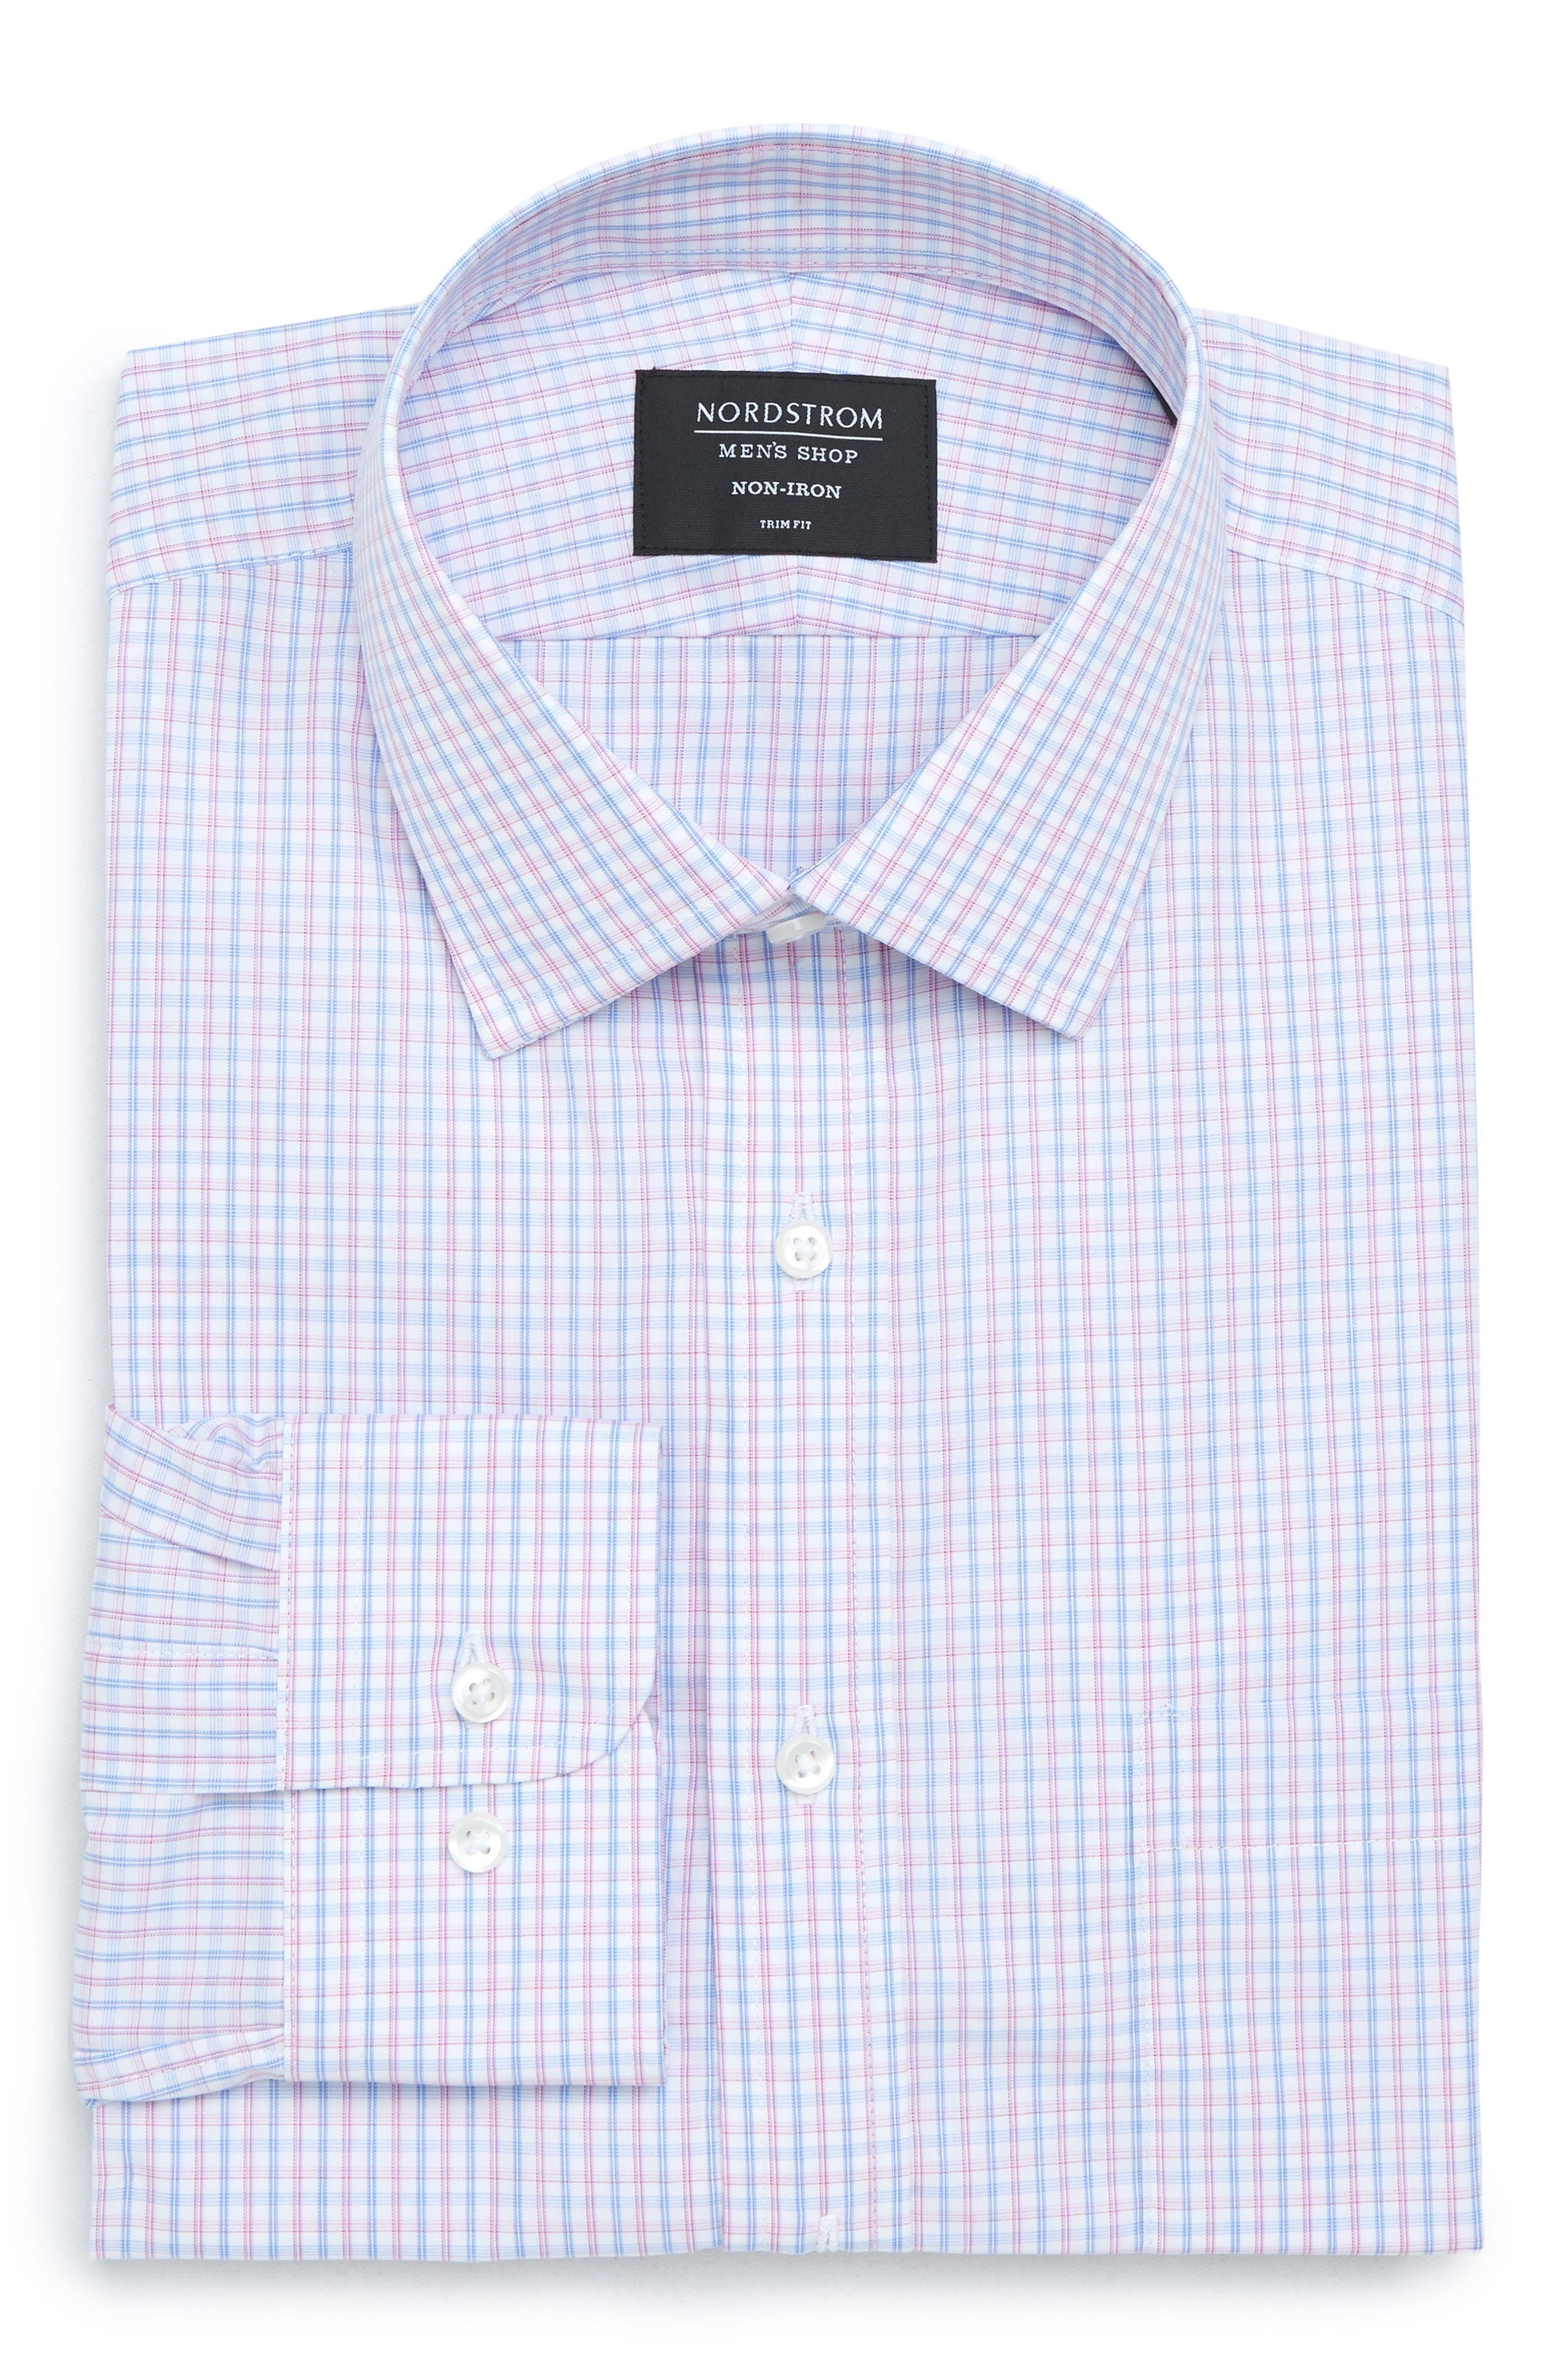 Nordstrom Trim Fit Non-Iron Check Dress Shirt,                             Alternate thumbnail 5, color,